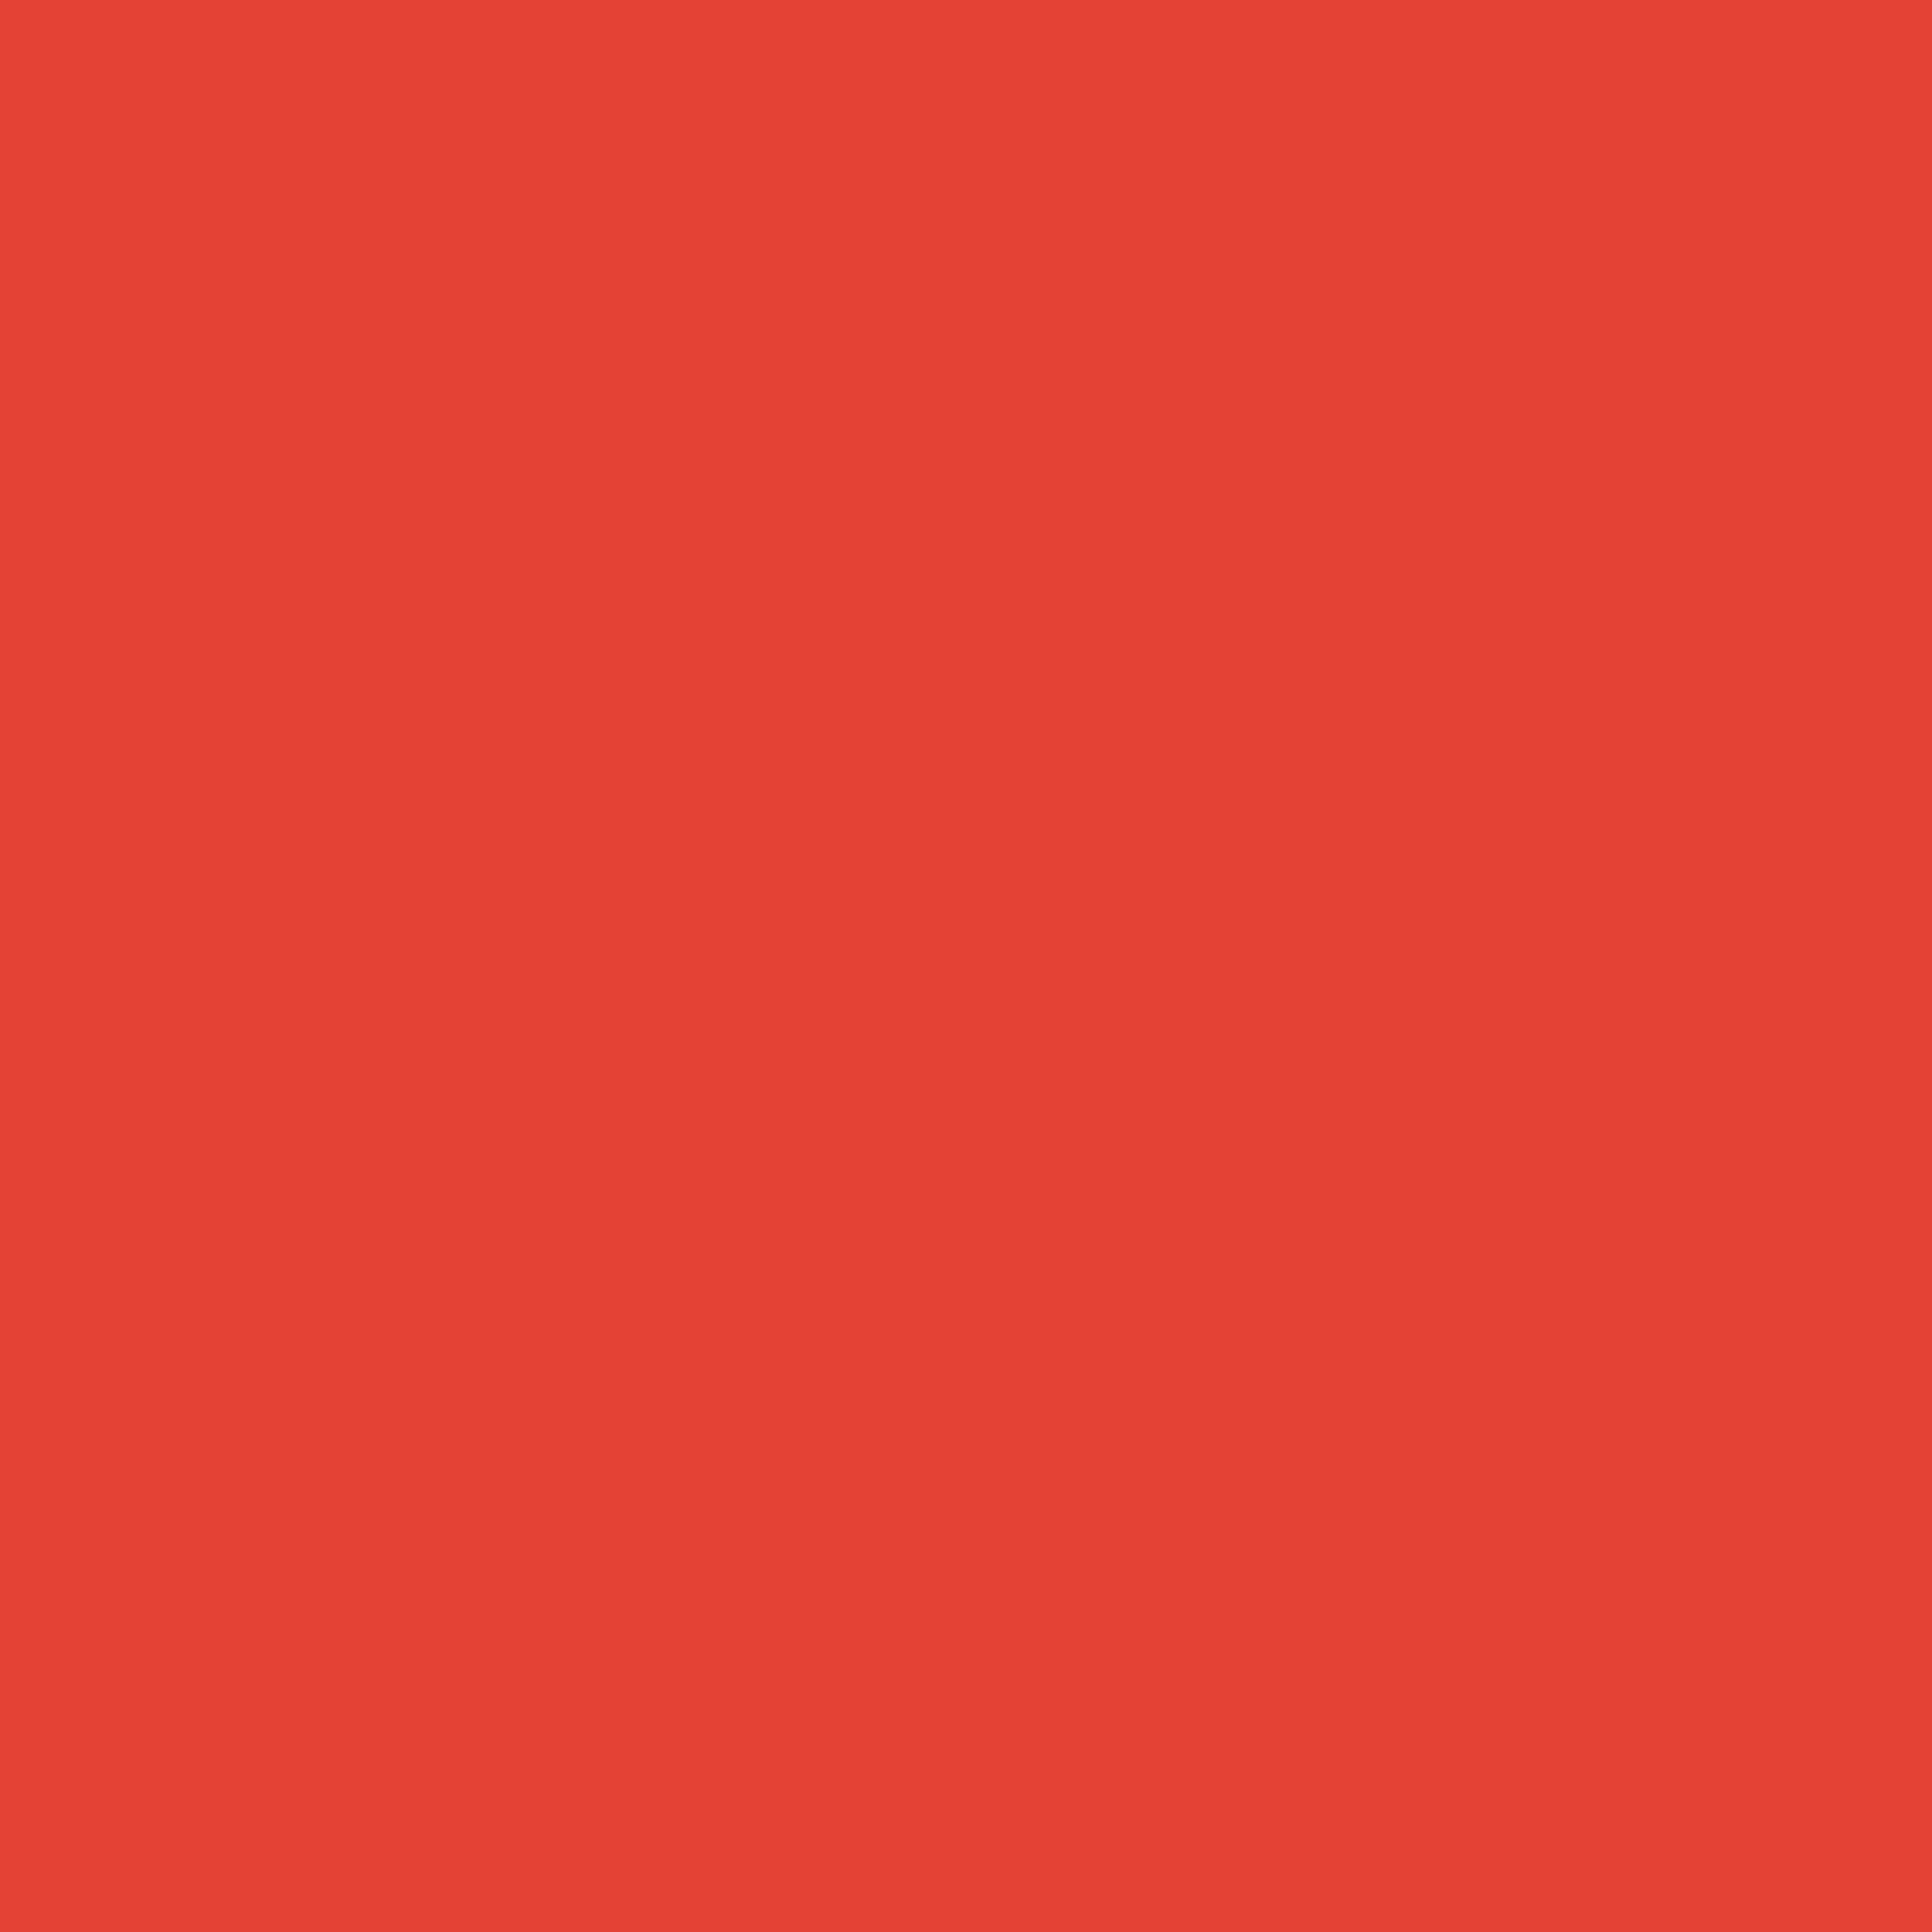 2048x2048 Vermilion Cinnabar Solid Color Background